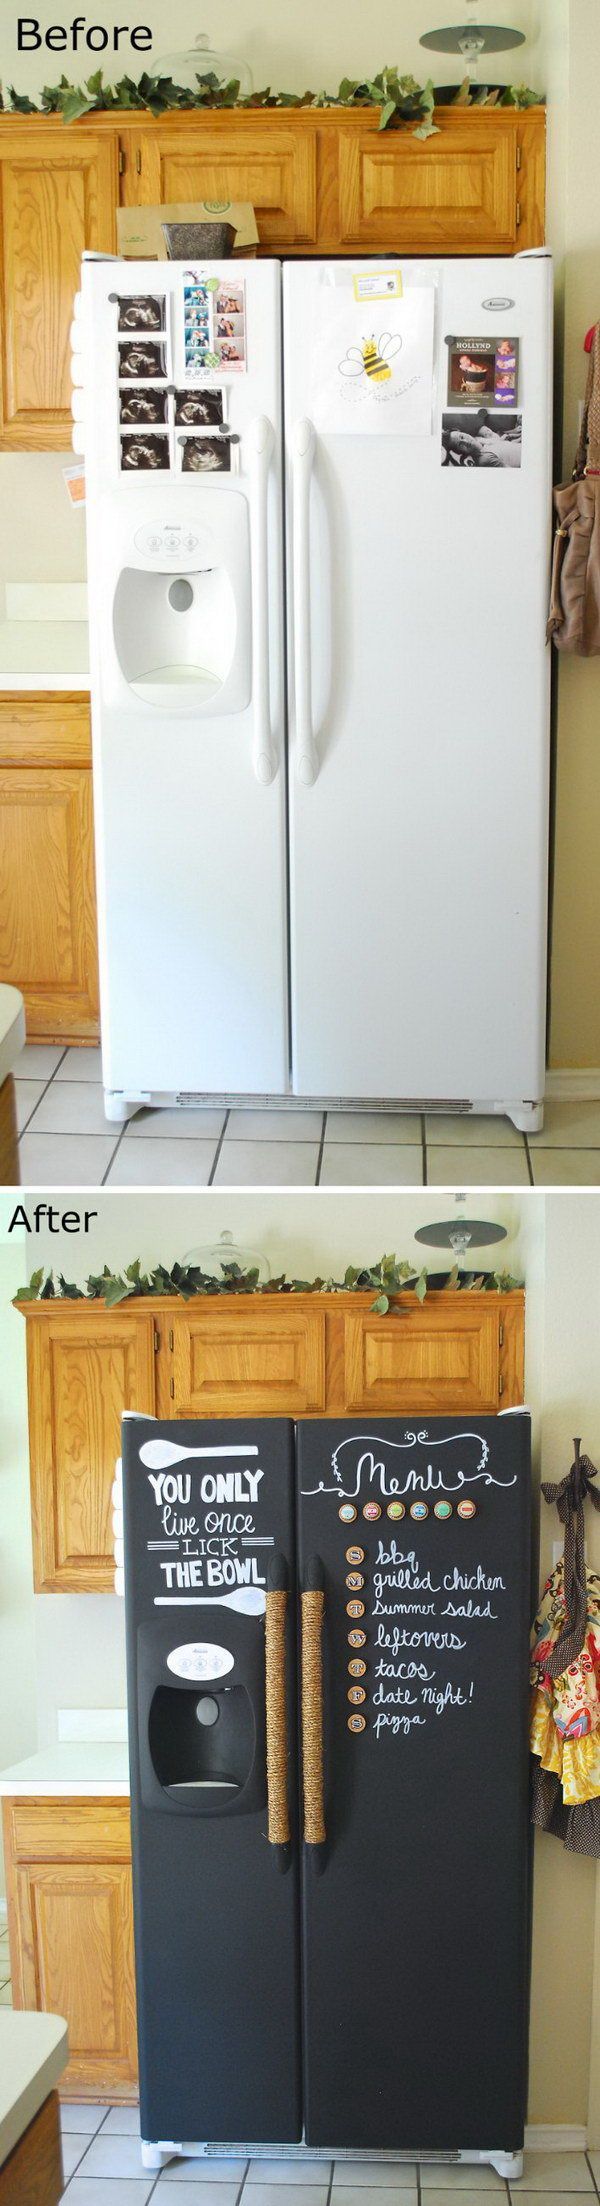 DIY Chalkboard Paint Refrigerator.                              …                                                                                                                                                                                 More